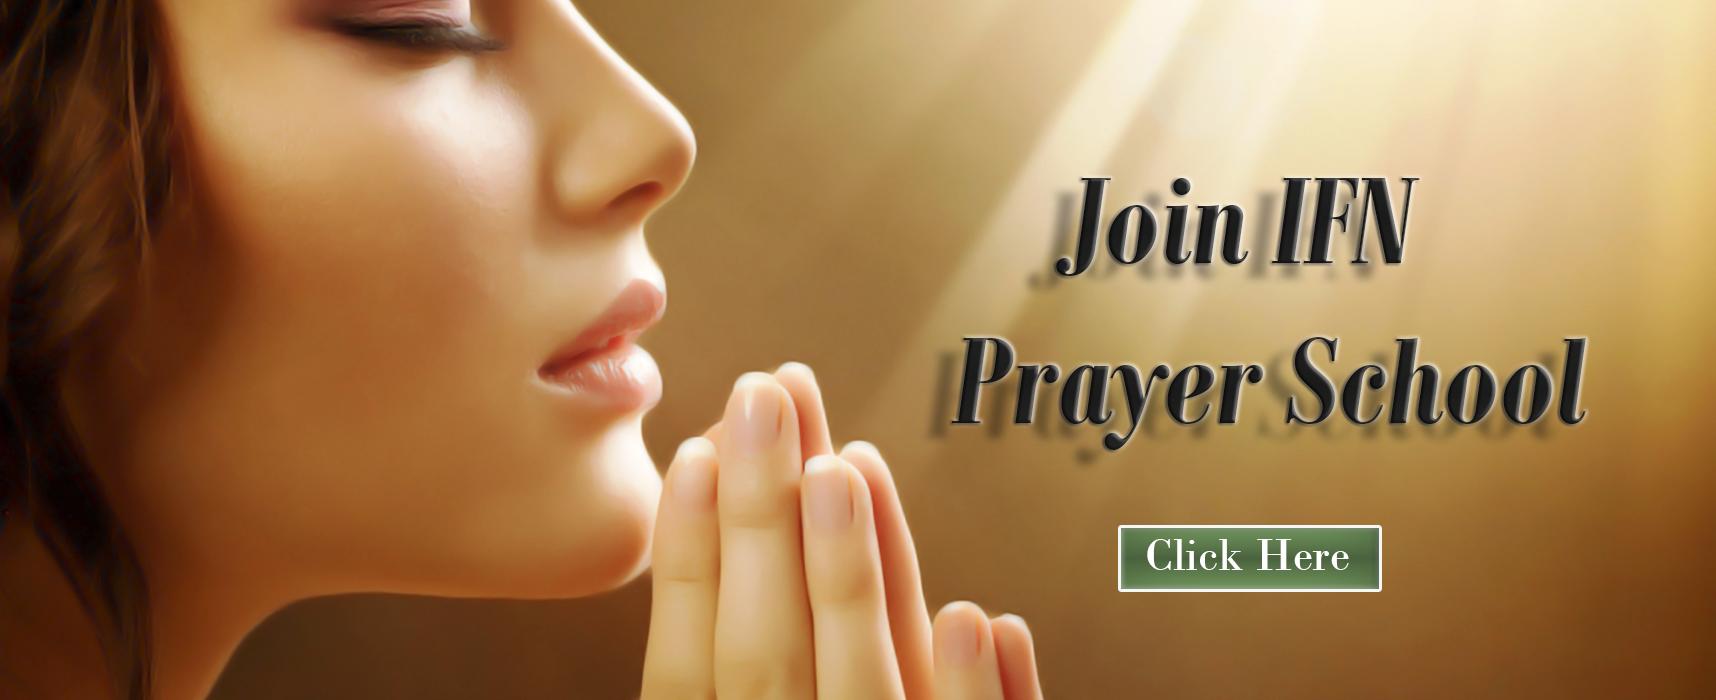 prayer-school